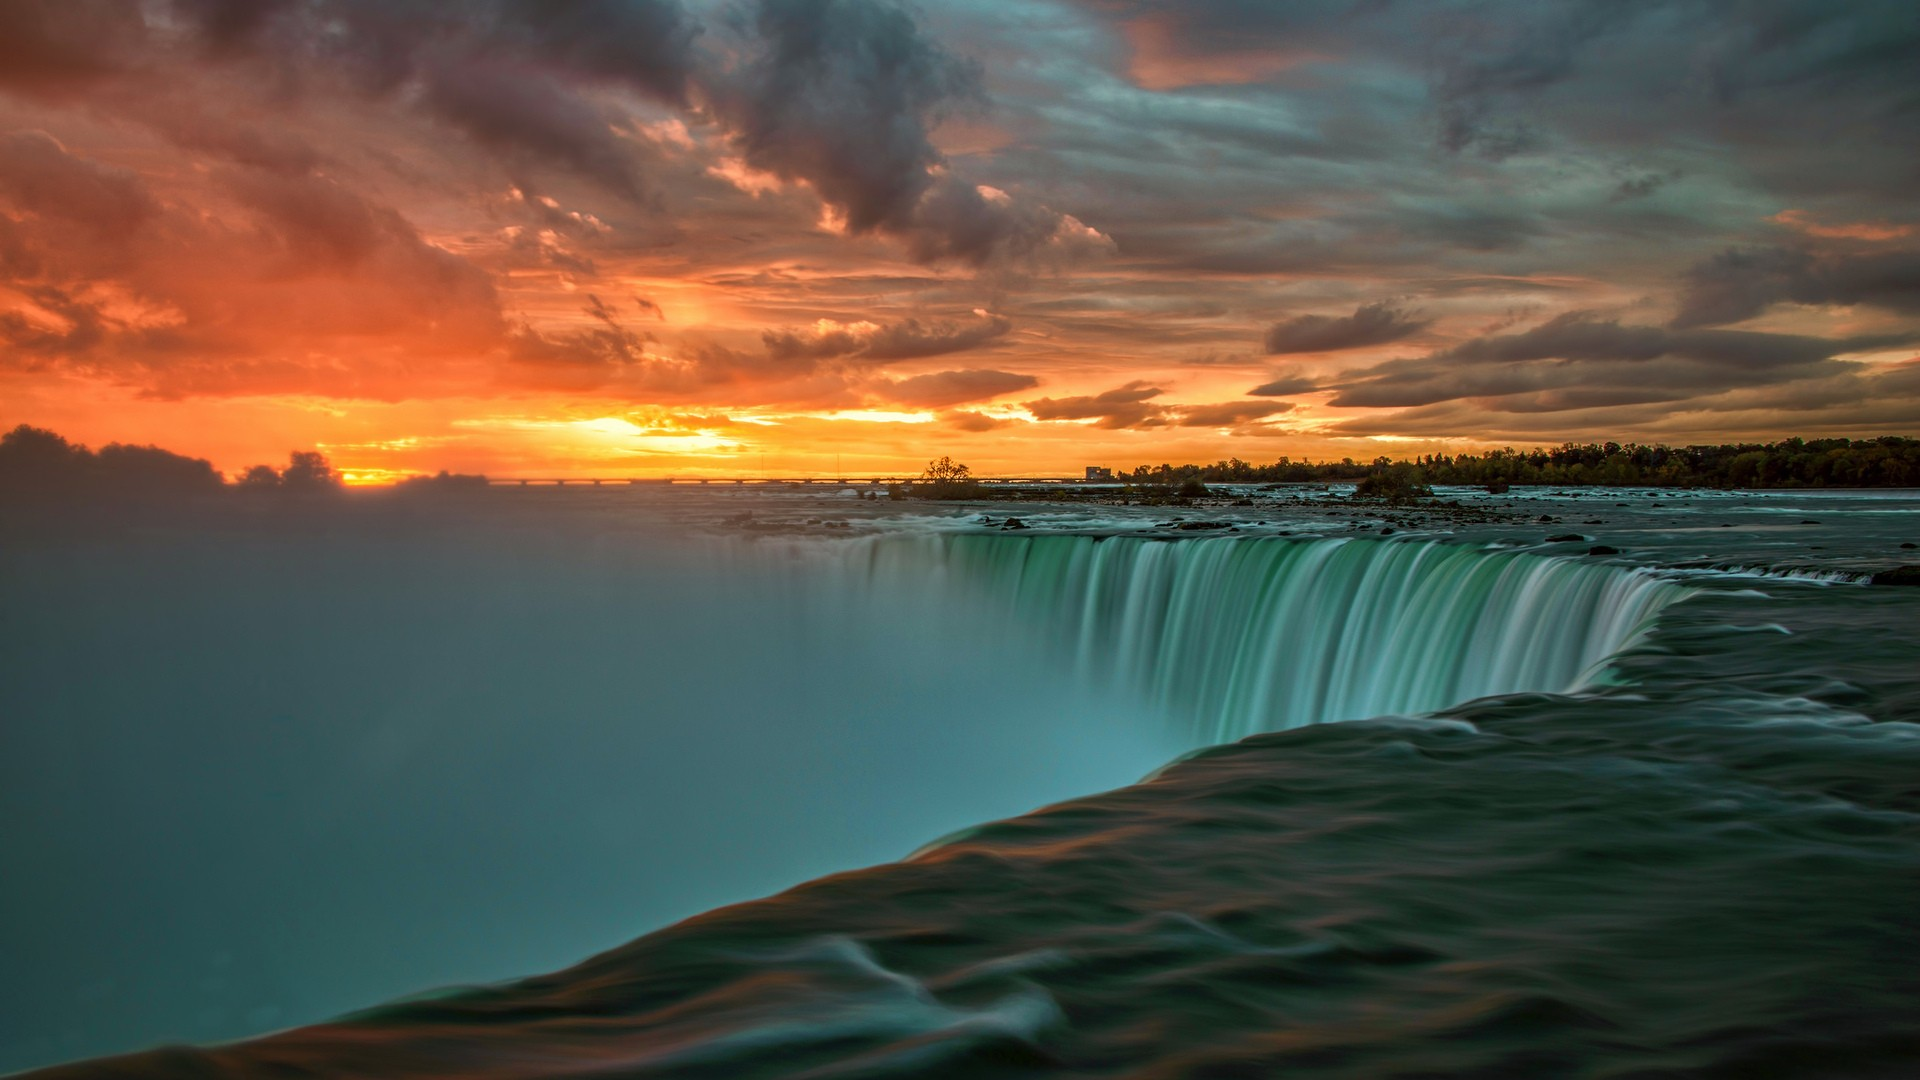 General 1920x1080 nature landscape sunset clouds water Niagara Falls waterfall long exposure trees stones Canada Ontario